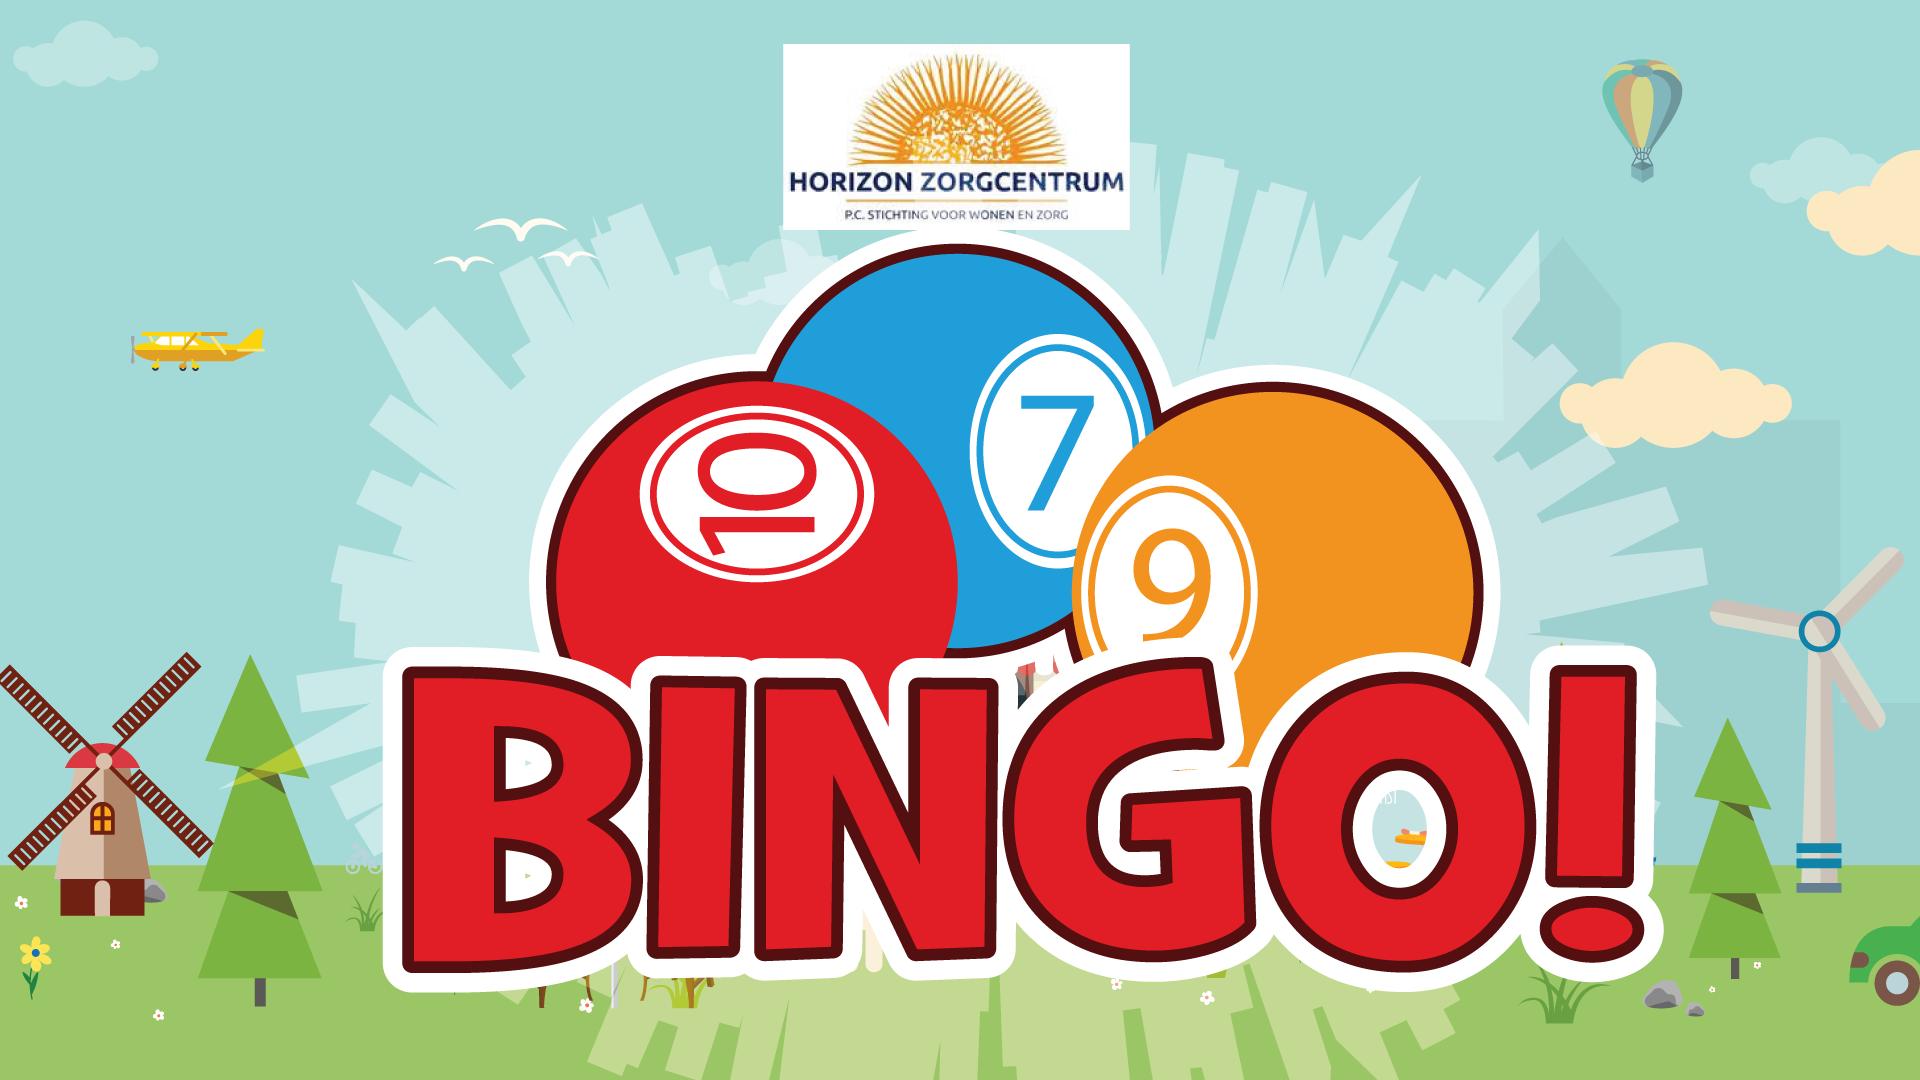 /var/www/html/wp-content/uploads/2018/09/bingo